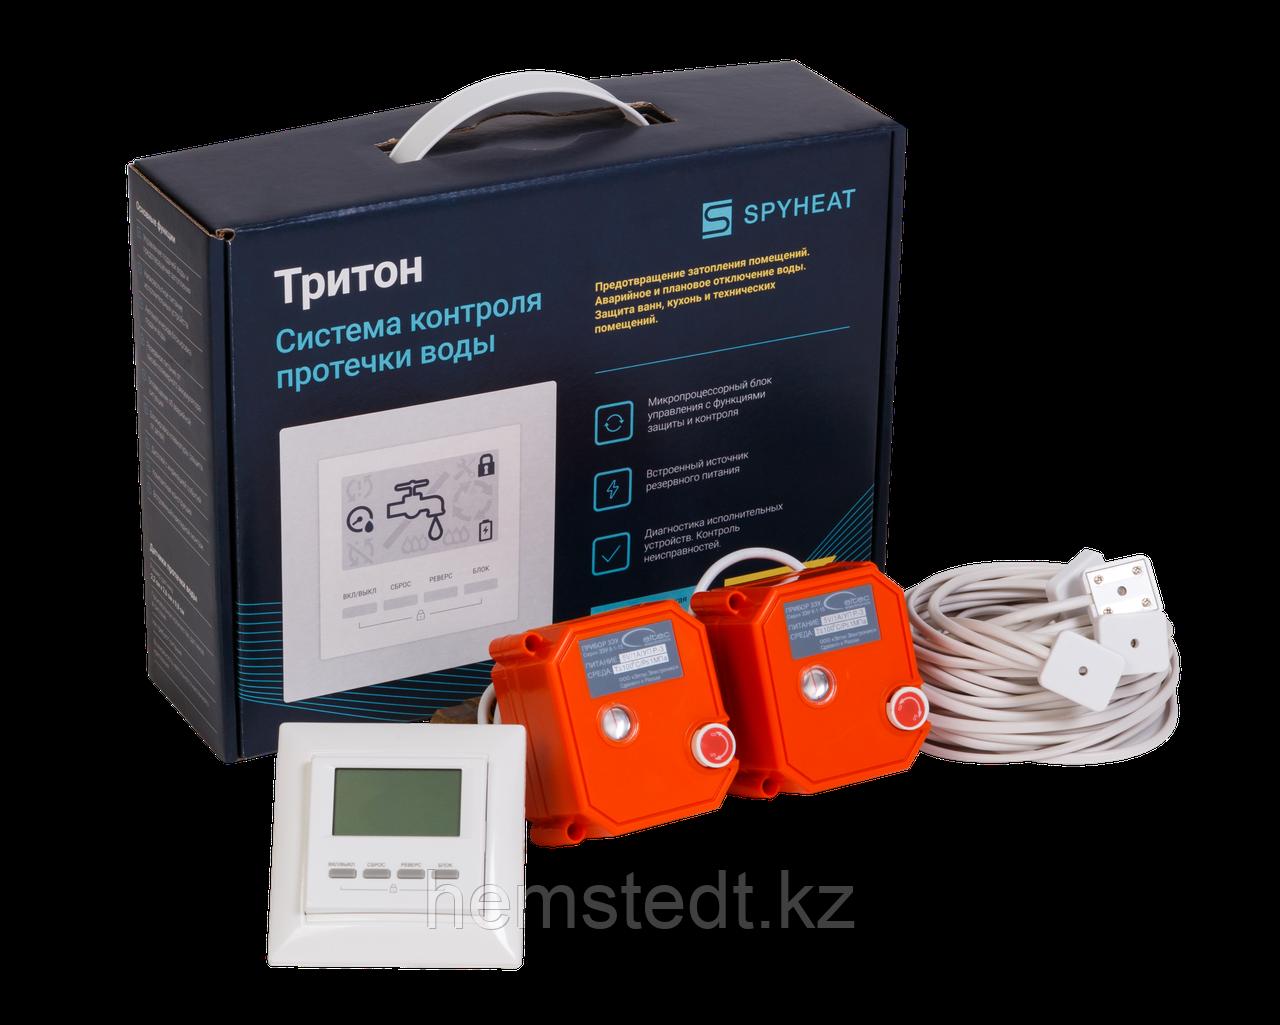 Система защиты протечки воды «Тритон» 1/2'' (2 крана)